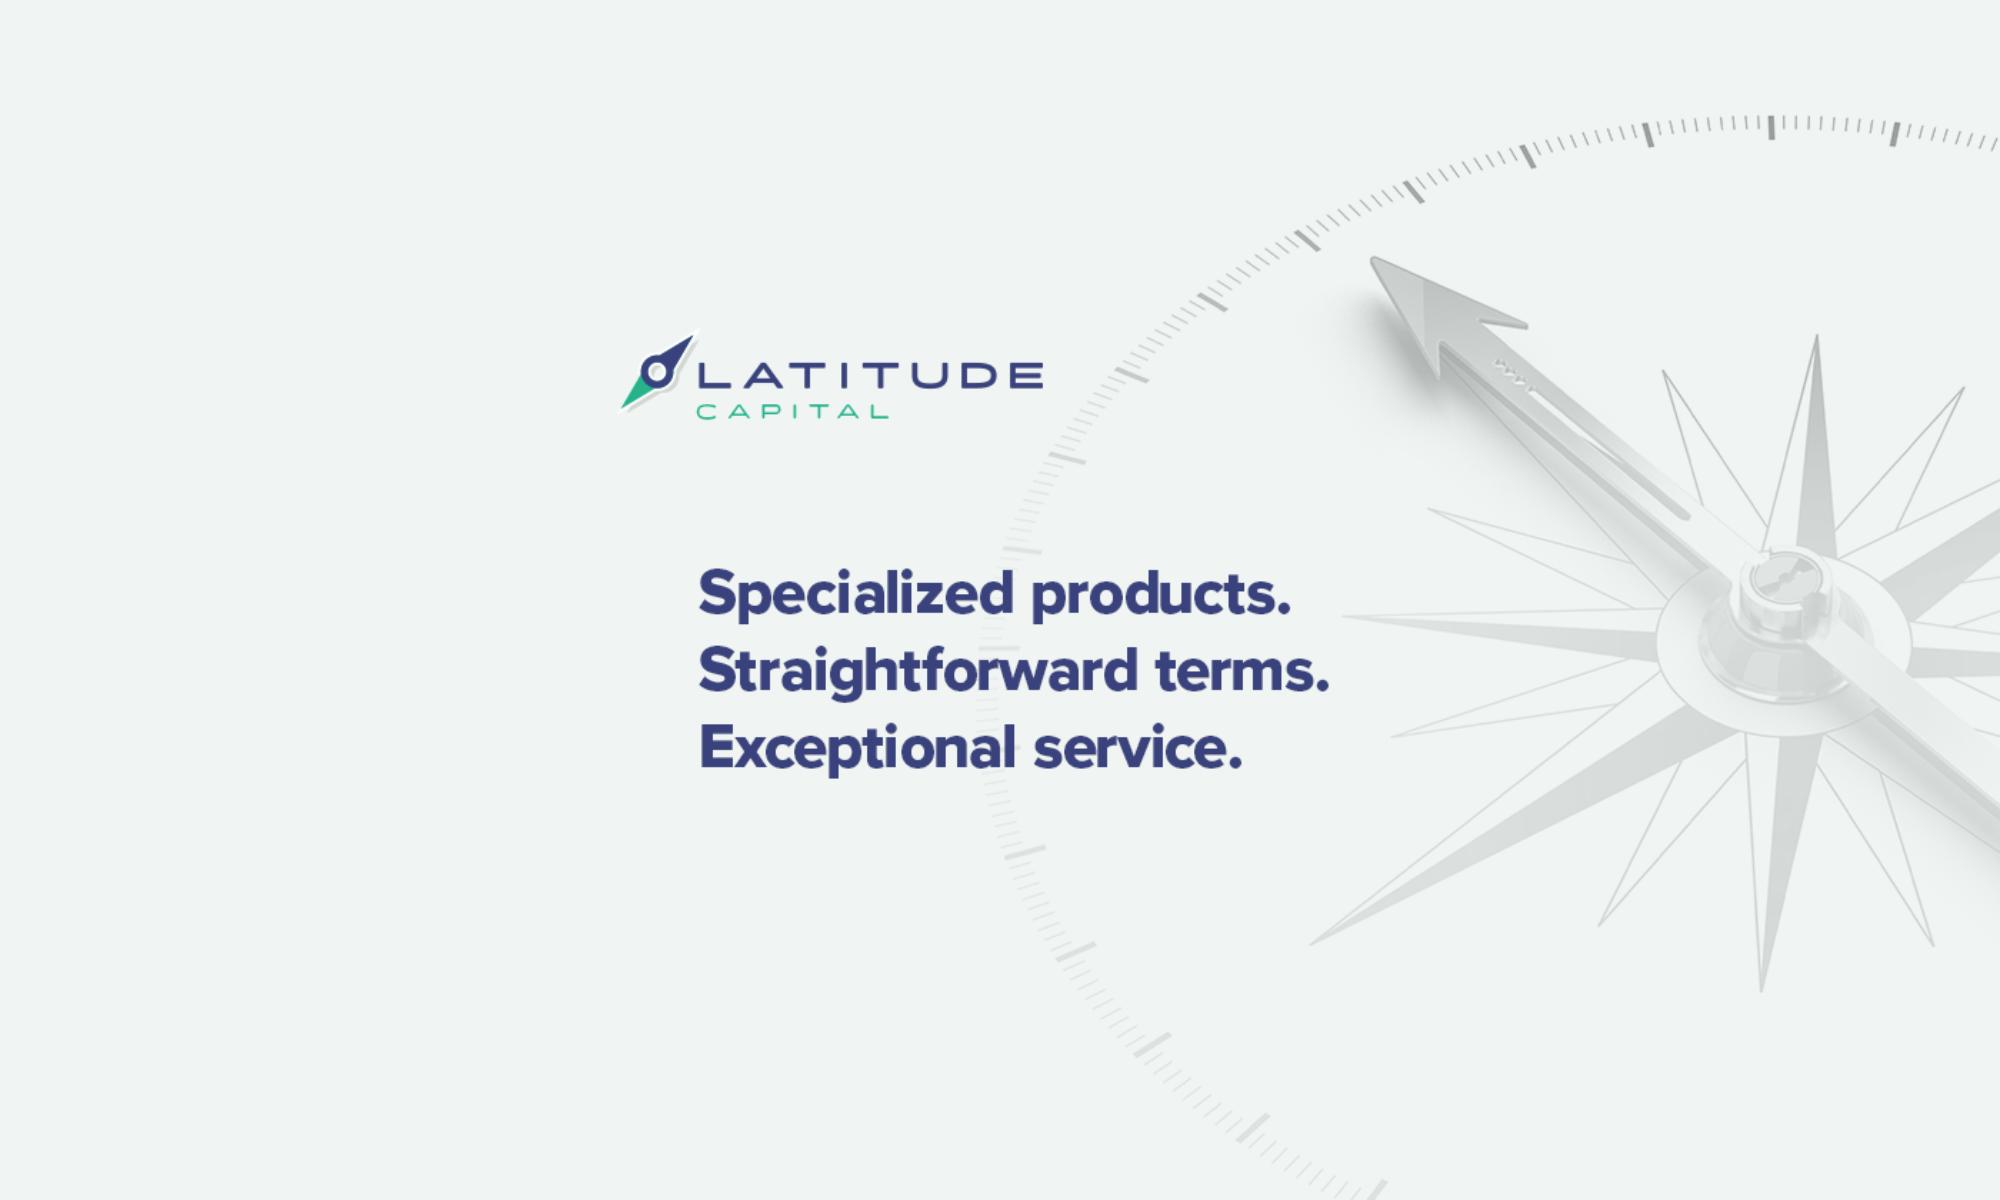 Latitude Capital, LLC